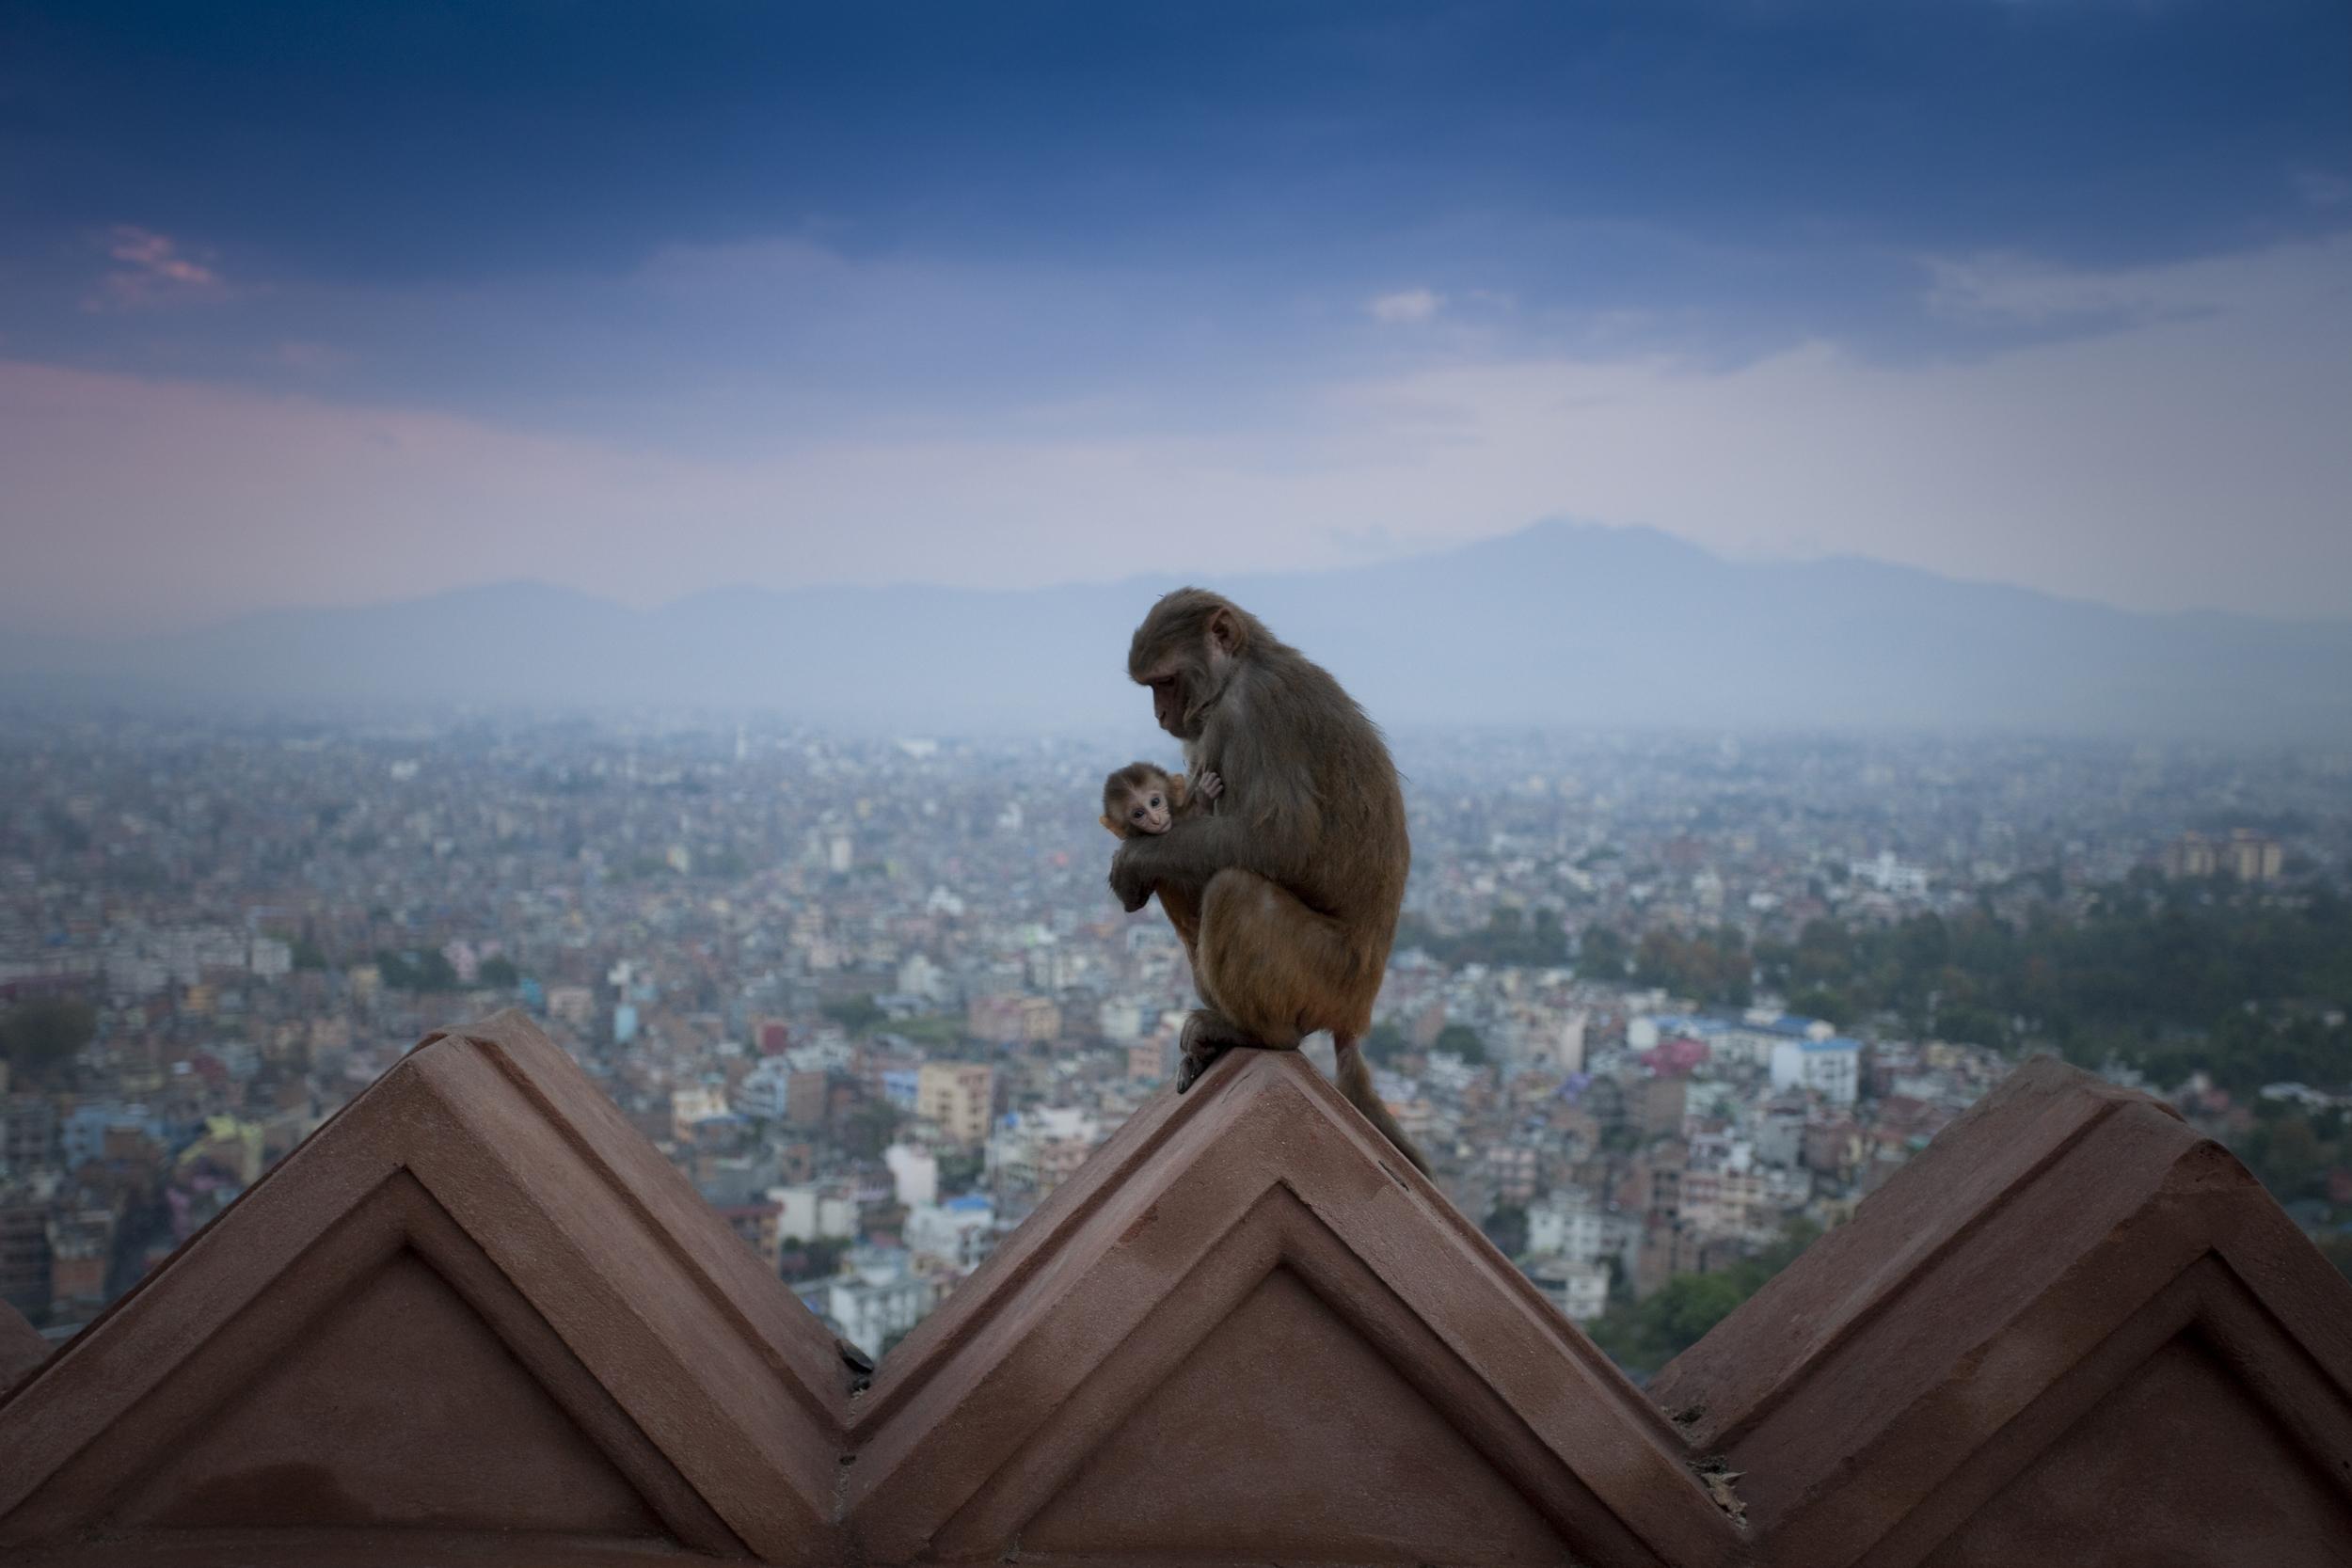 nepal_monkey_and_baby.jpg